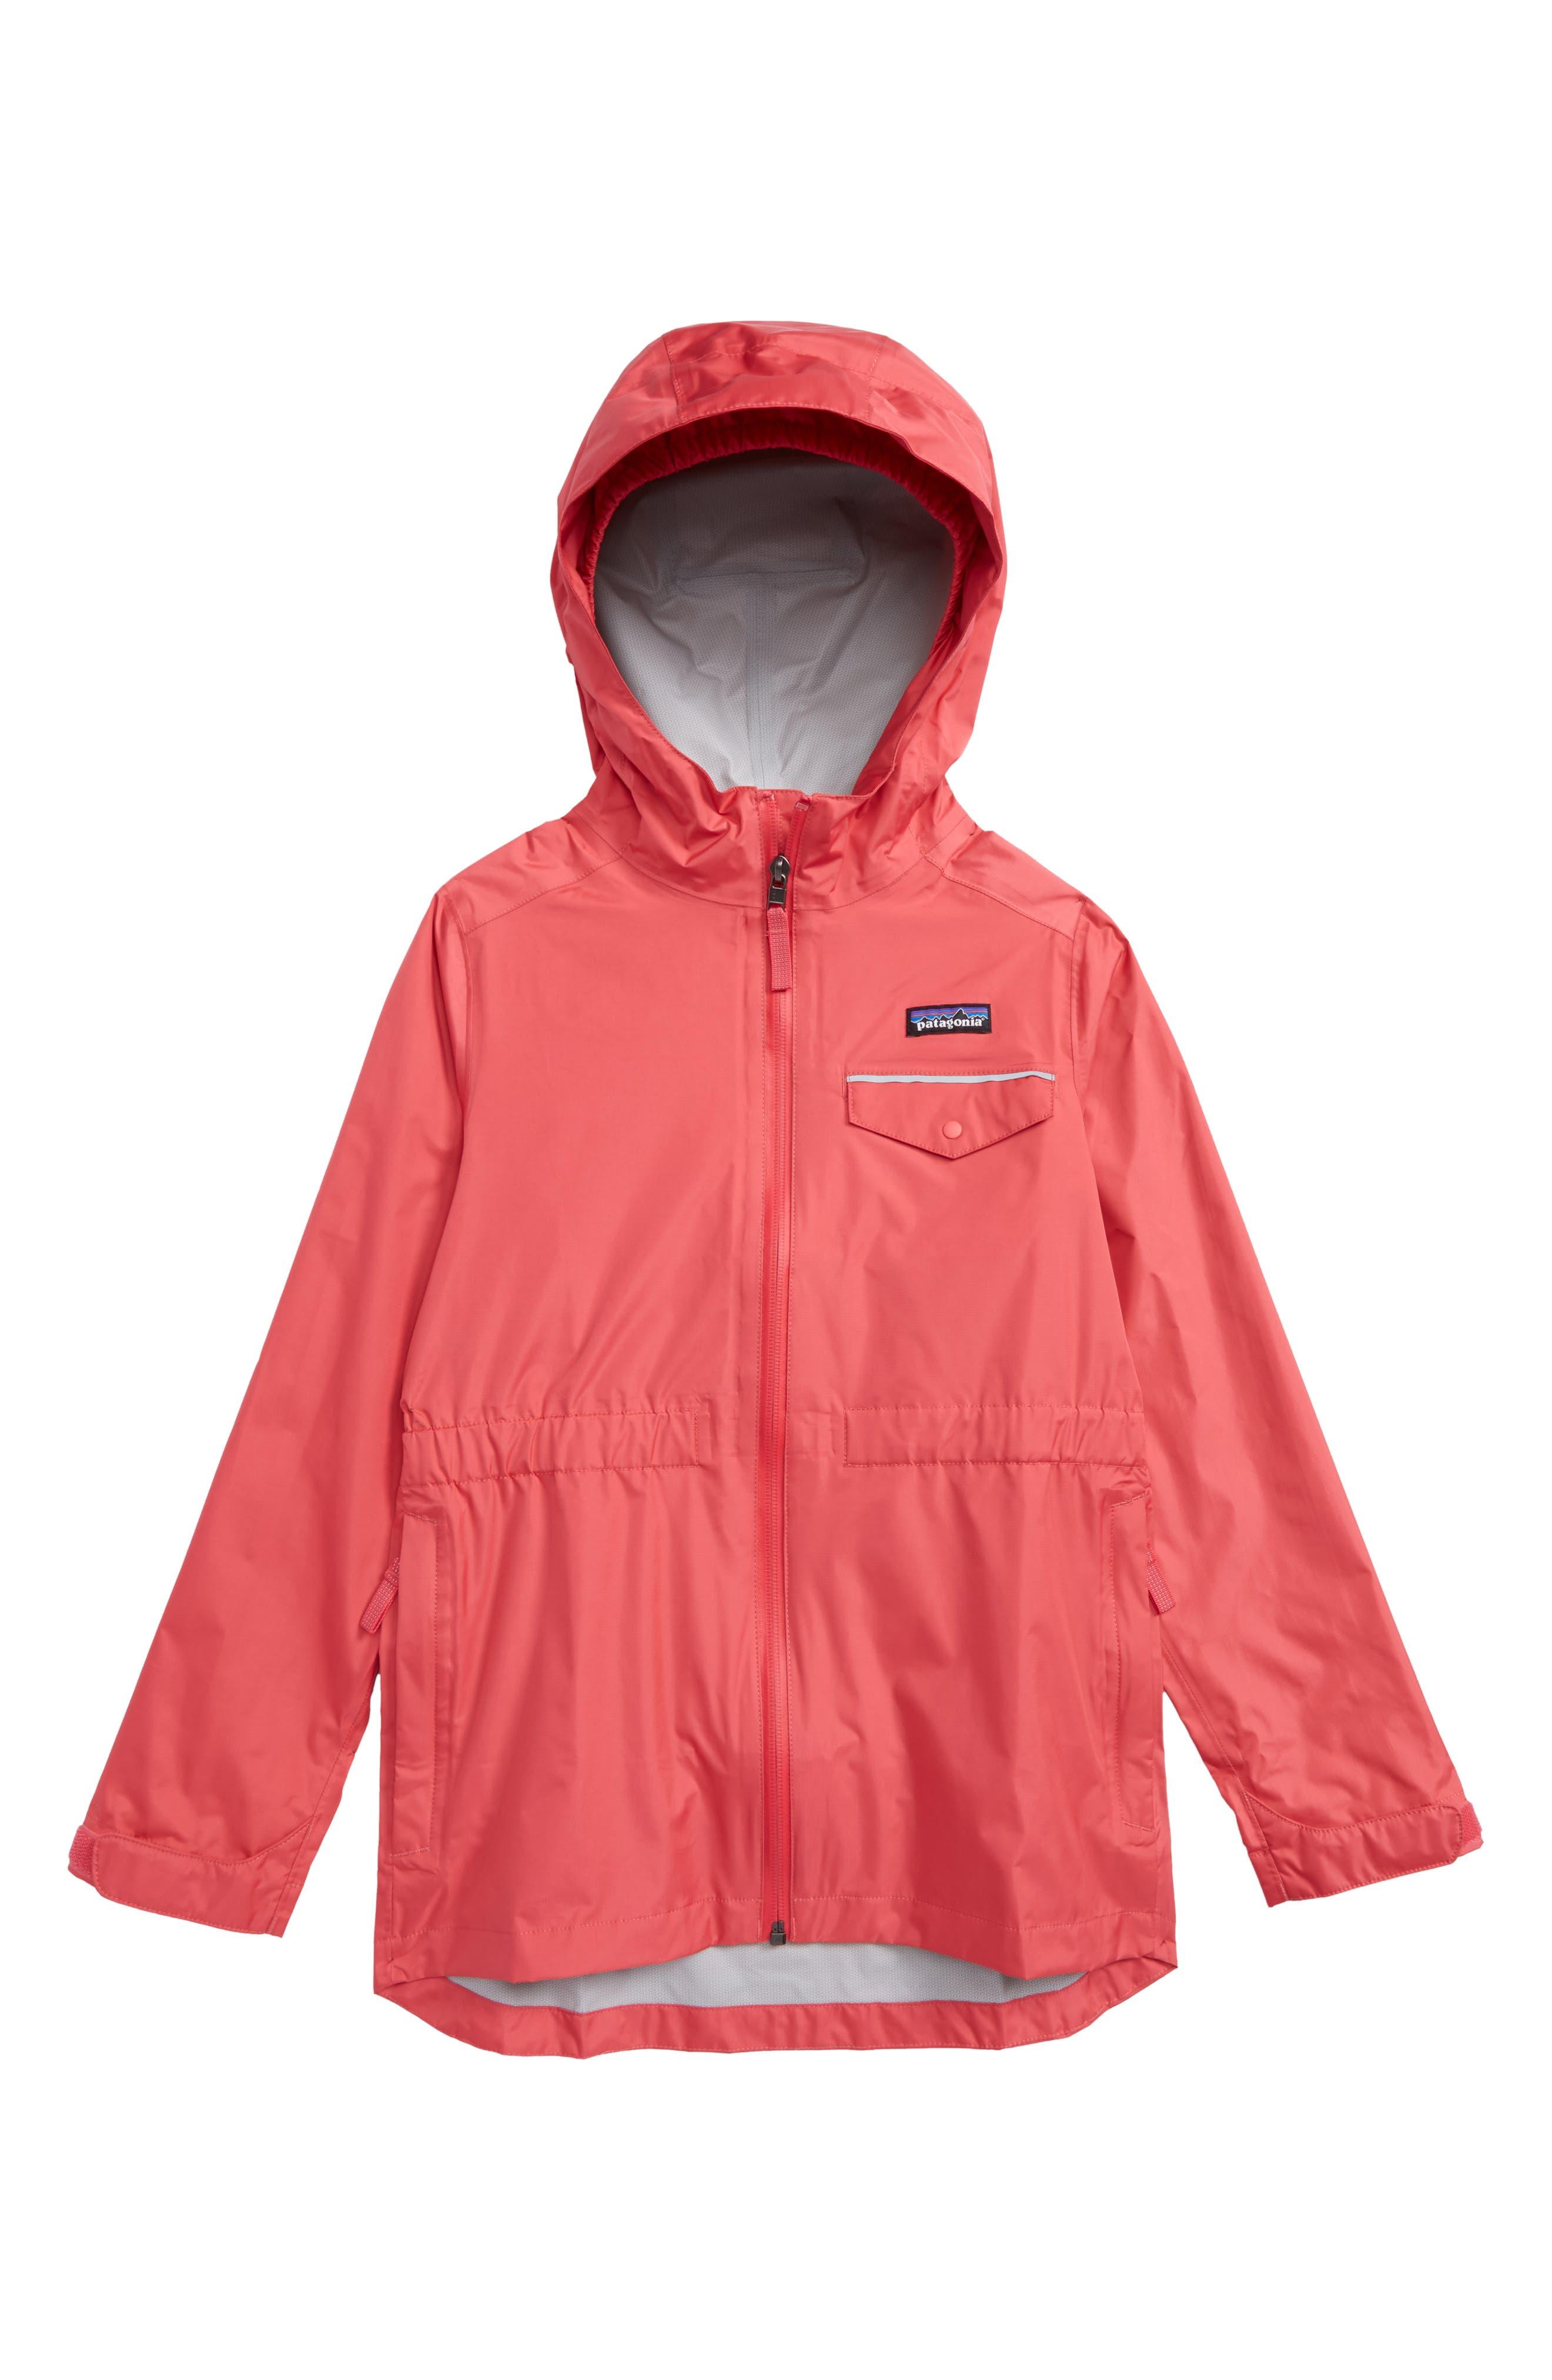 Torrentshell Jacket,                         Main,                         color, SIERRA PINK